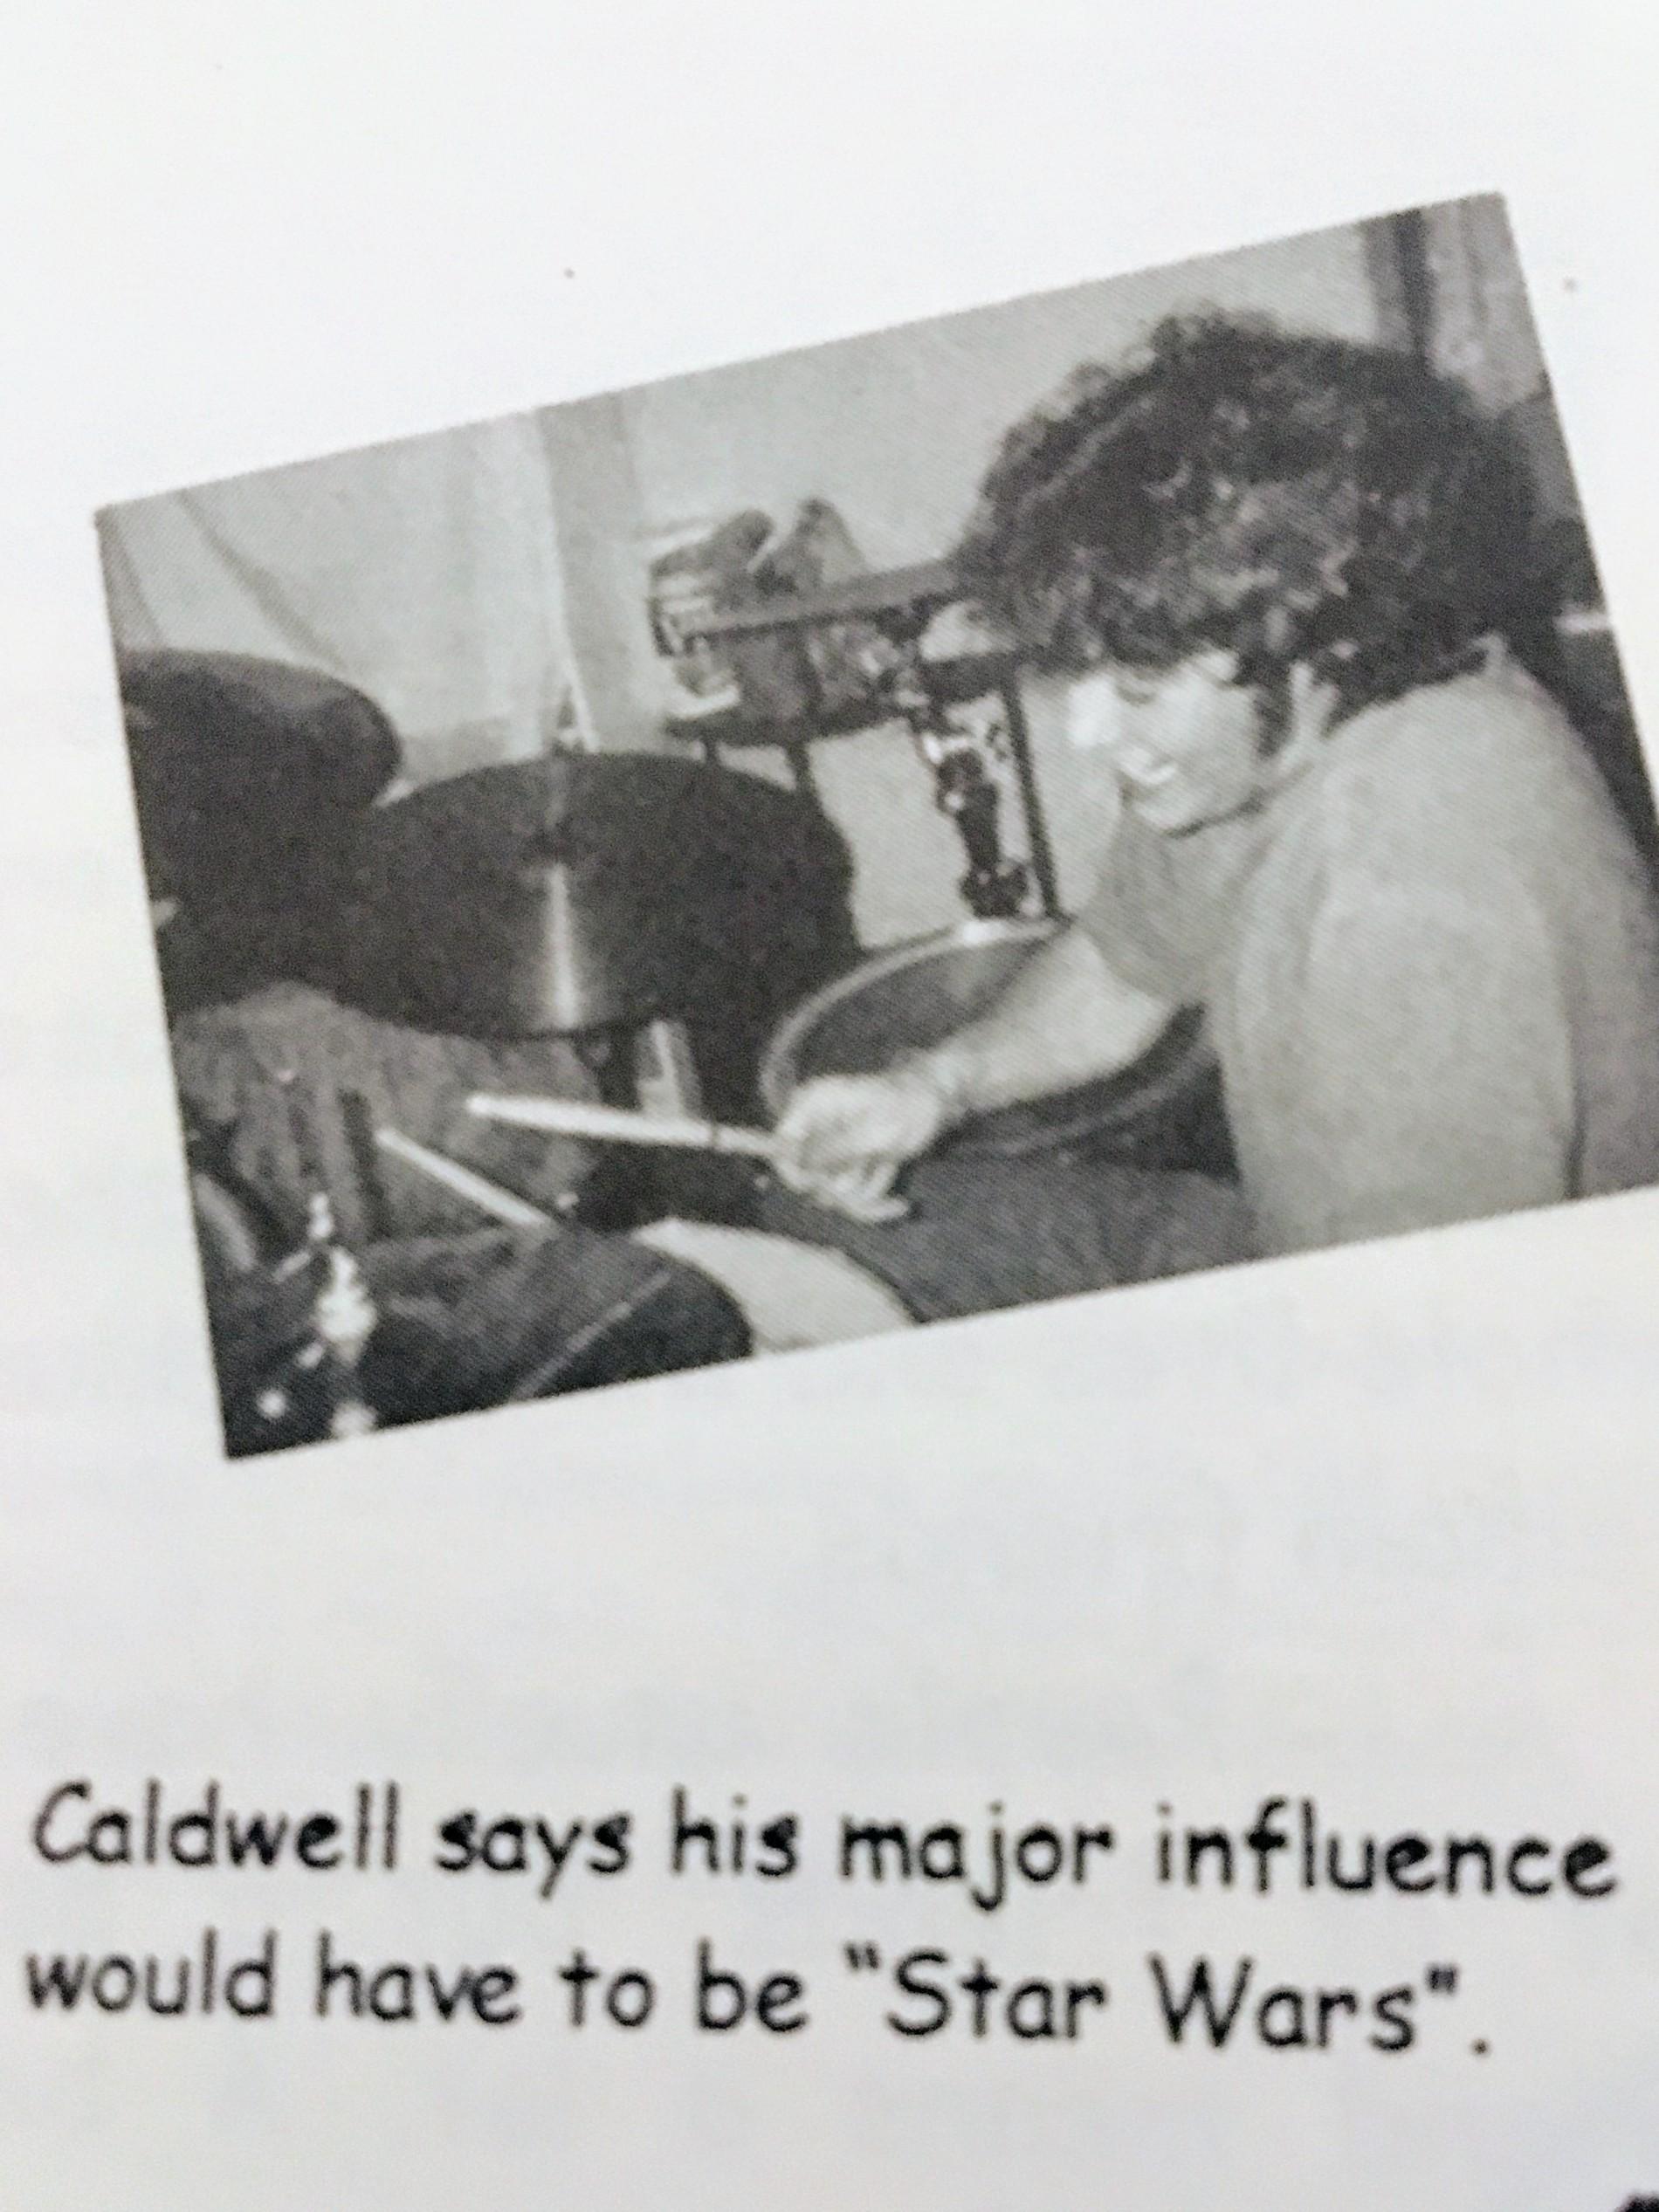 caldwellIMG_0876.jpg